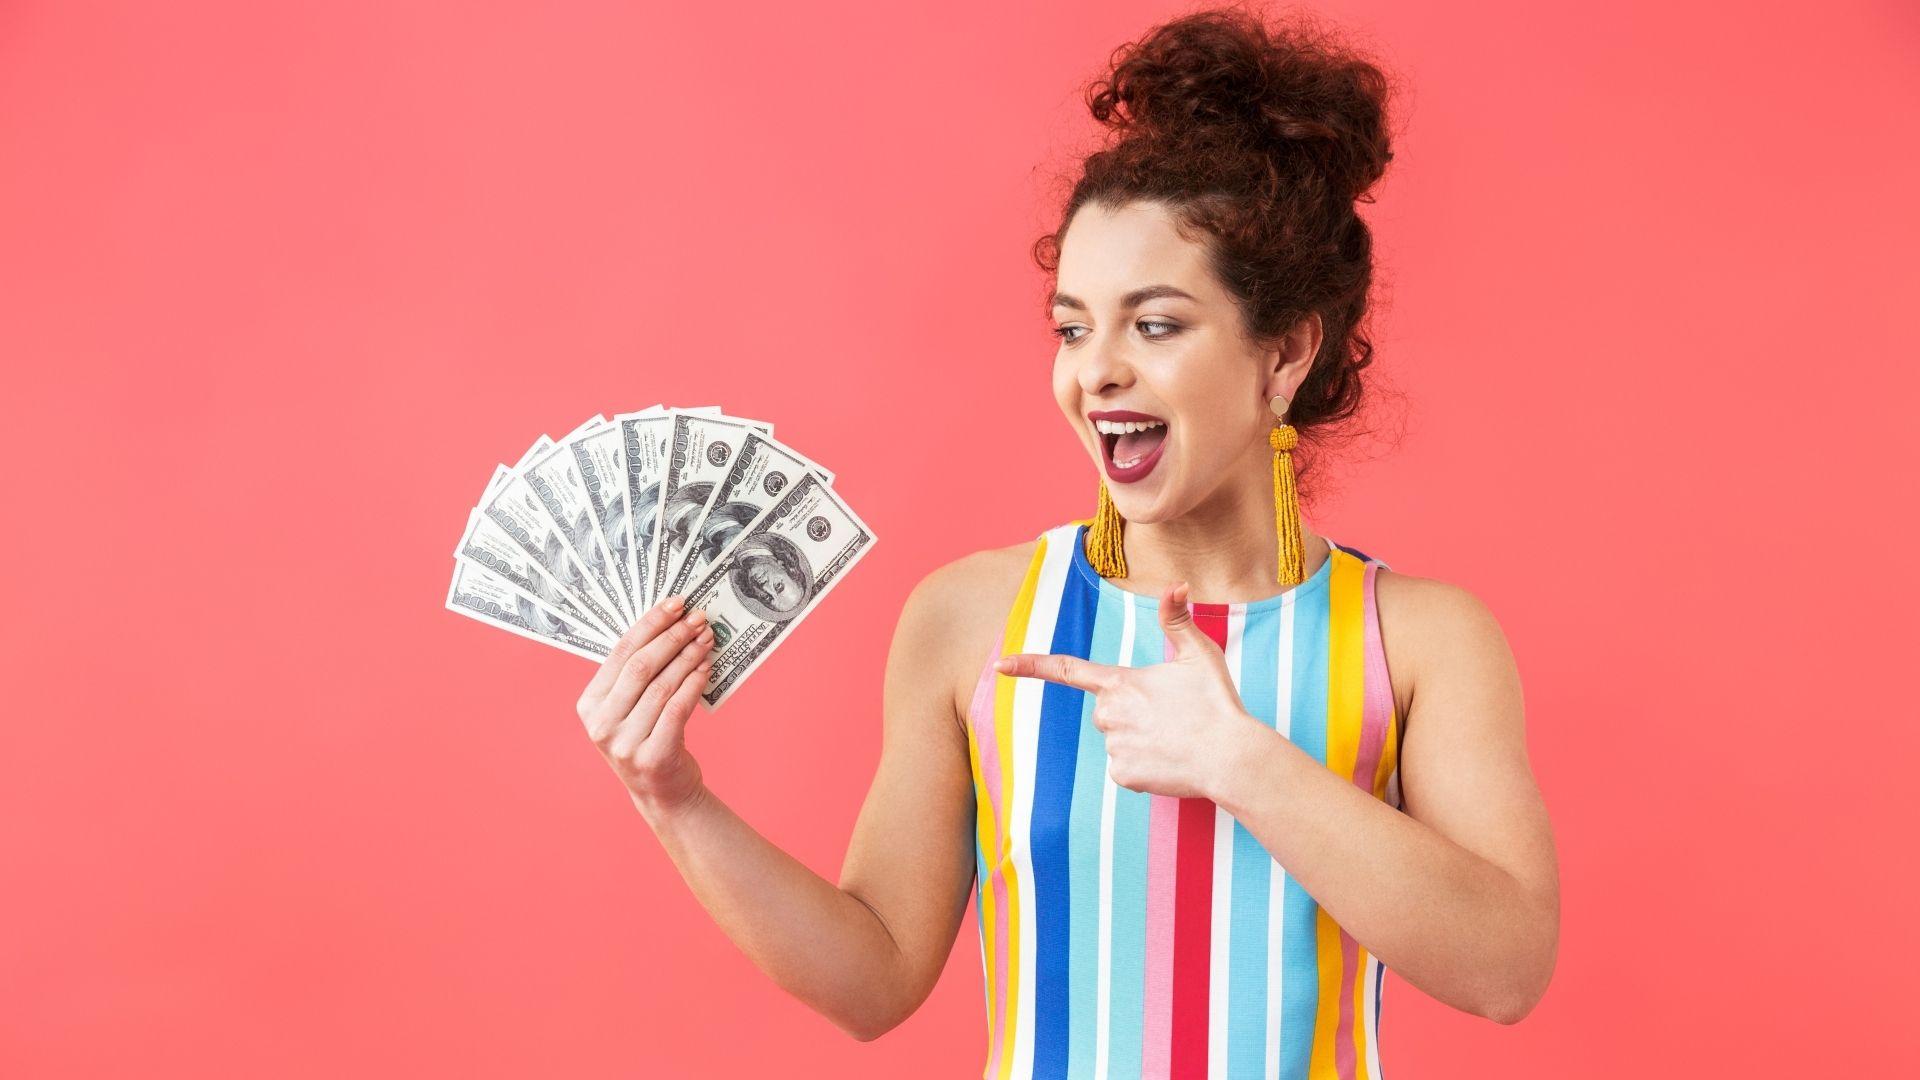 TikTok Woman with money in hand